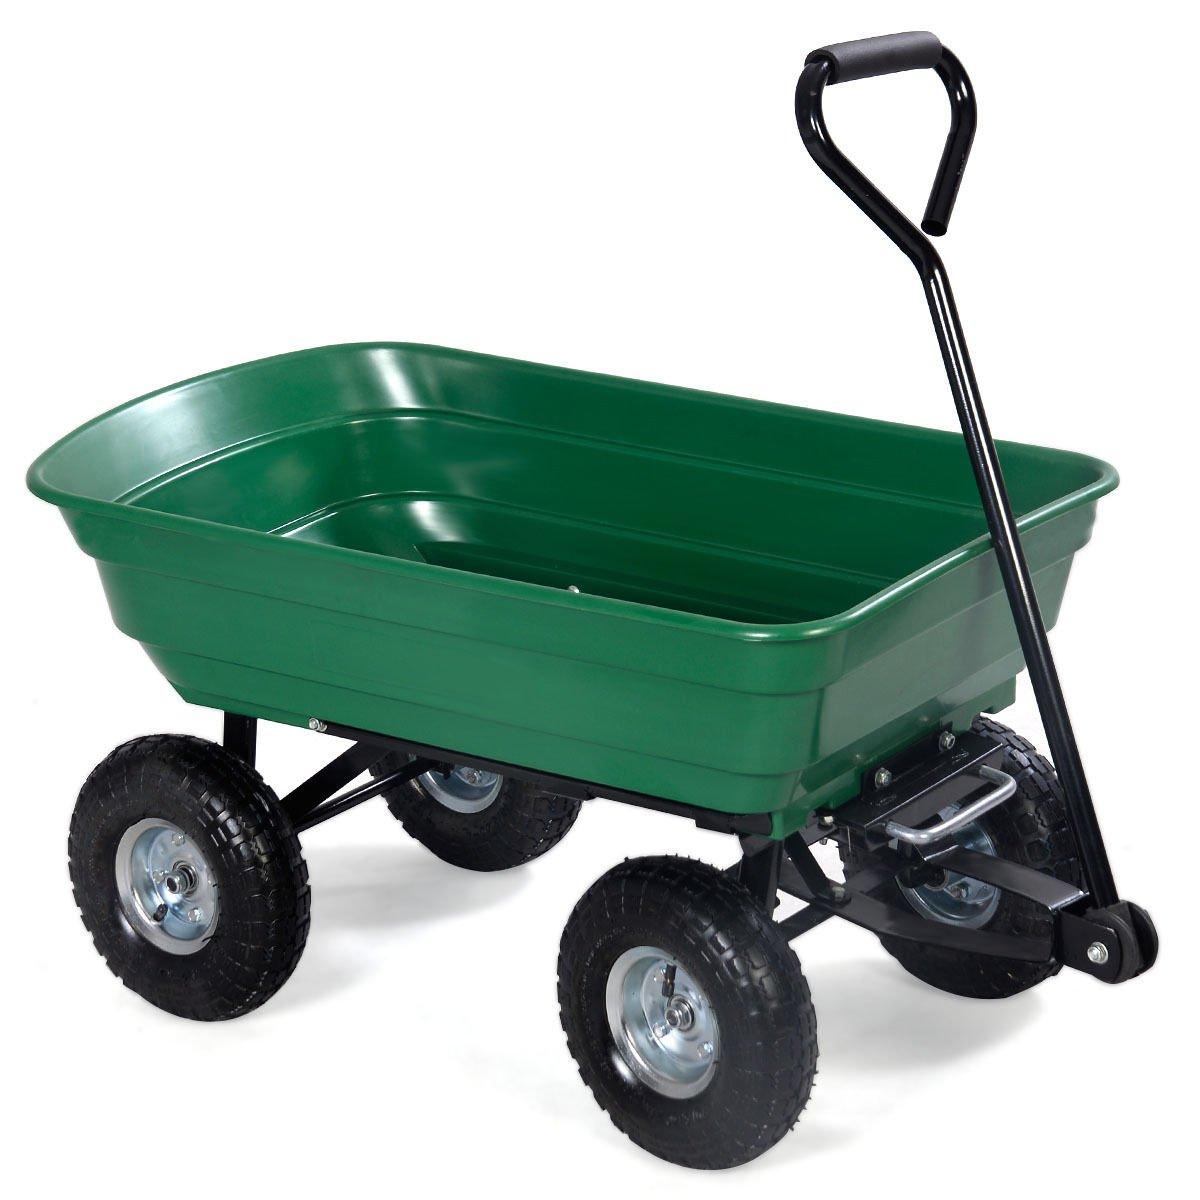 Garden Dump Cart Dumper Wagon Carrier Wheel Barrow Air Tires Heavy Duty 650LB